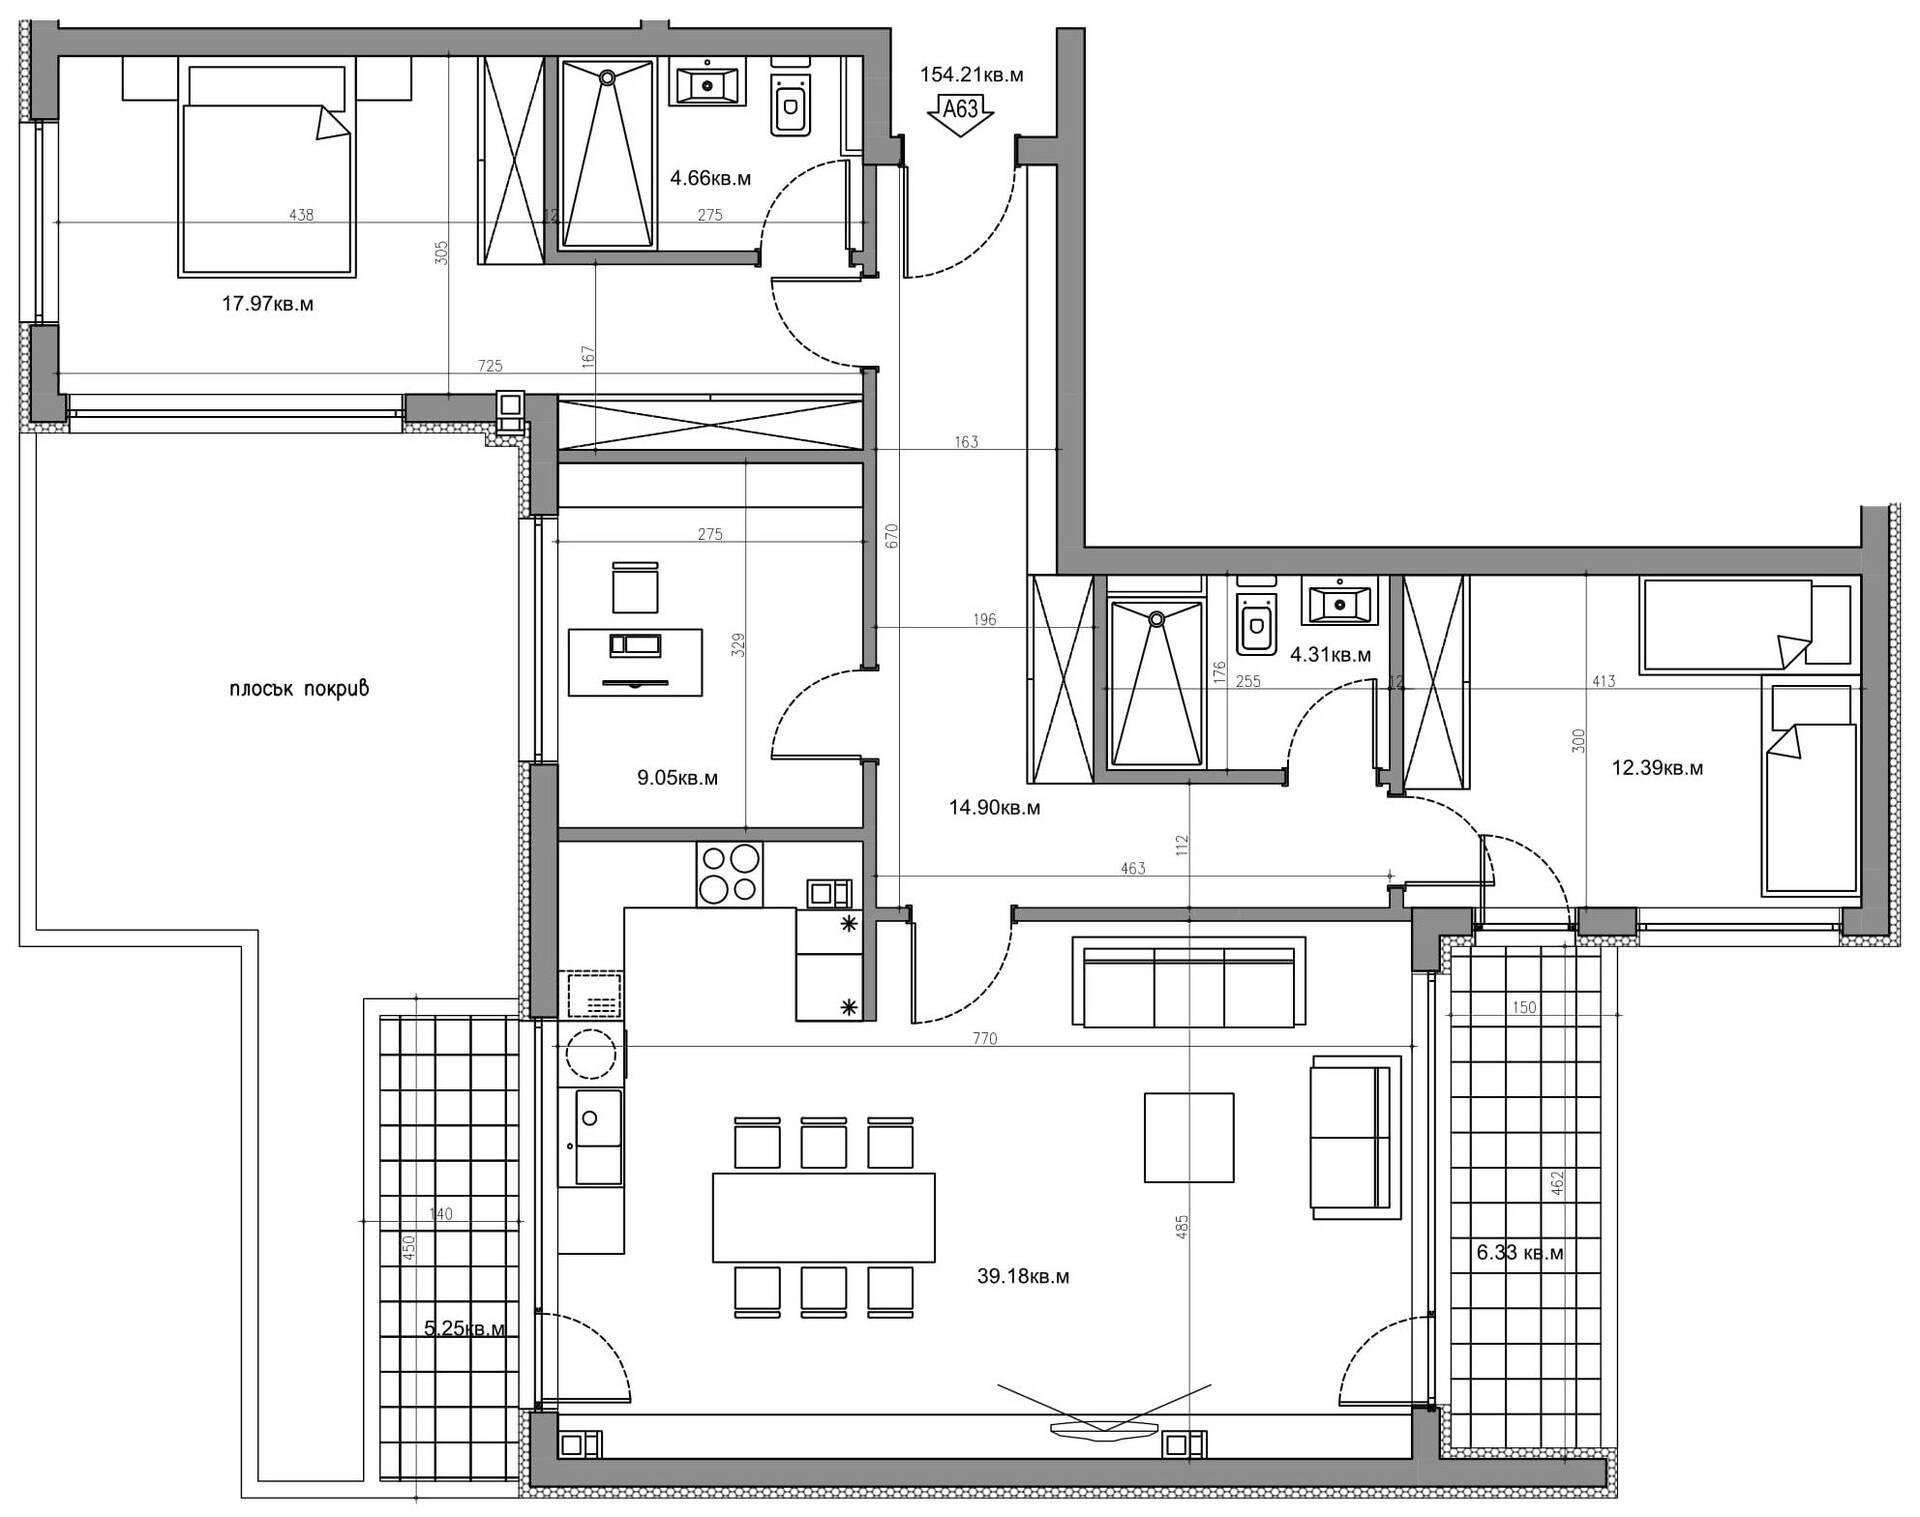 Vinitsa_Apartment_3_63